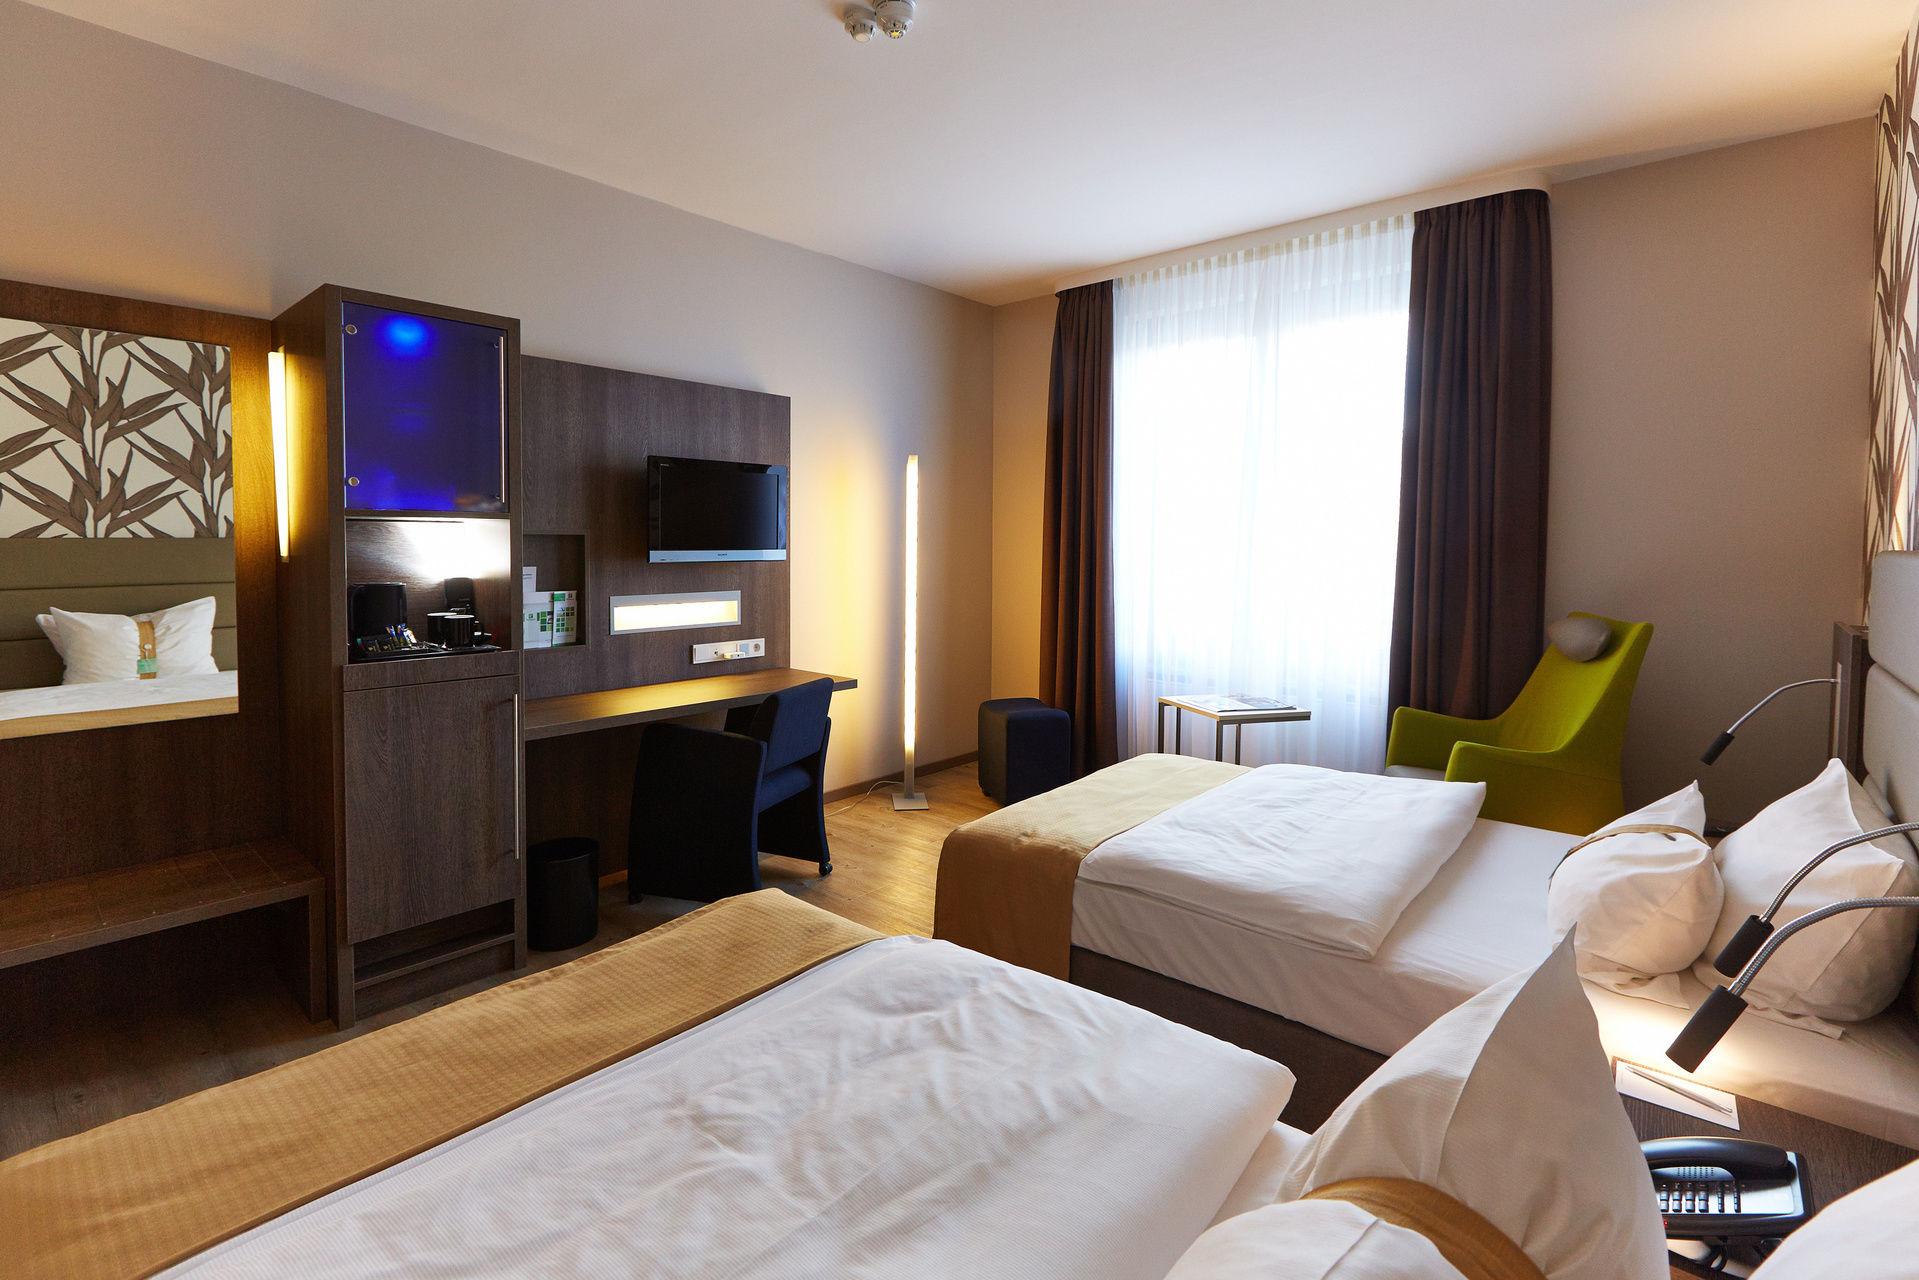 Hotel Regensburg Gunstig